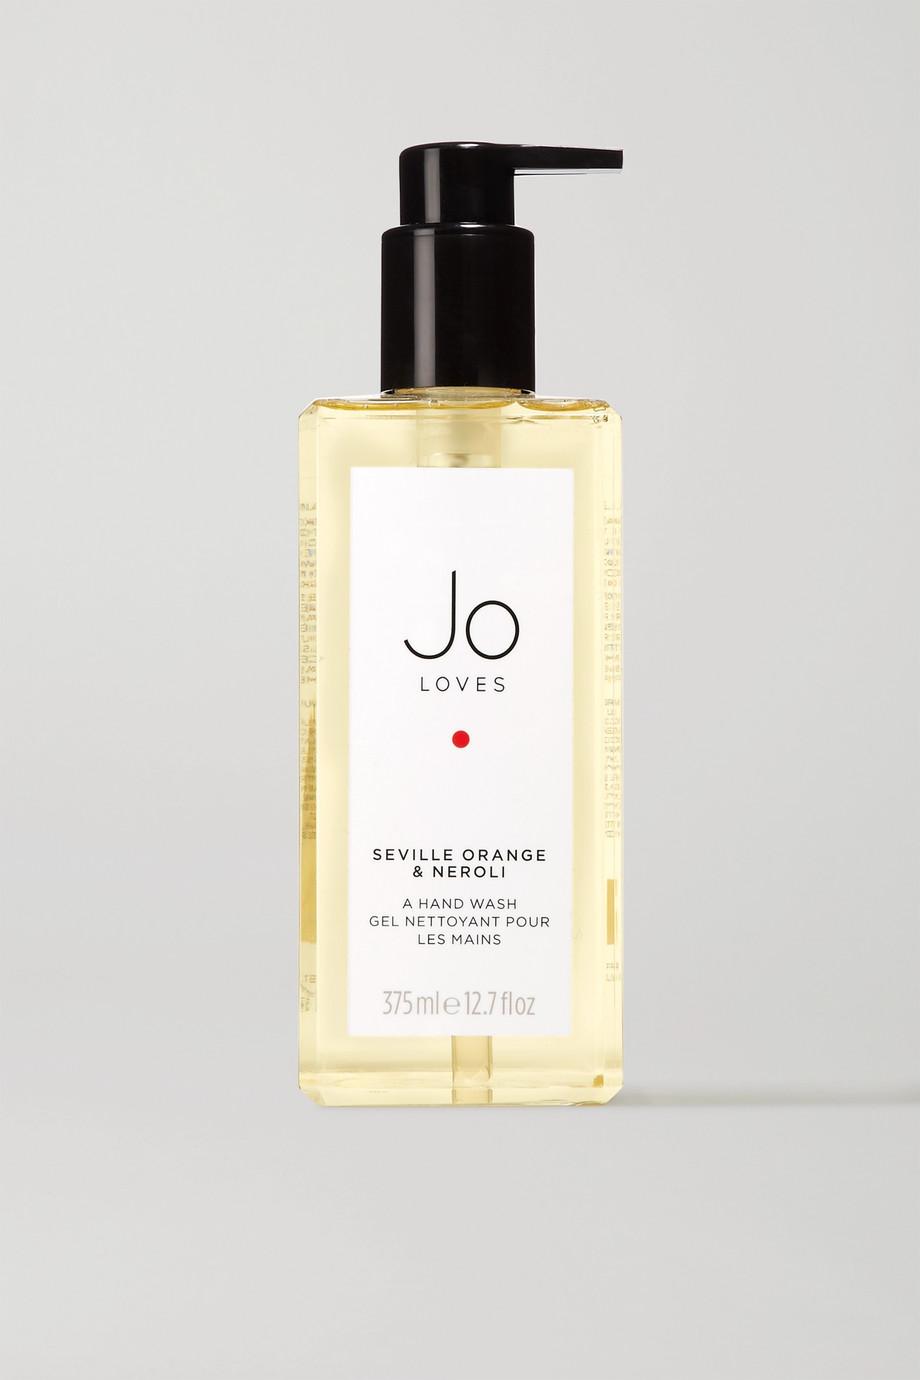 Jo Loves Seville Orange & Neroli Hand Wash, 375ml